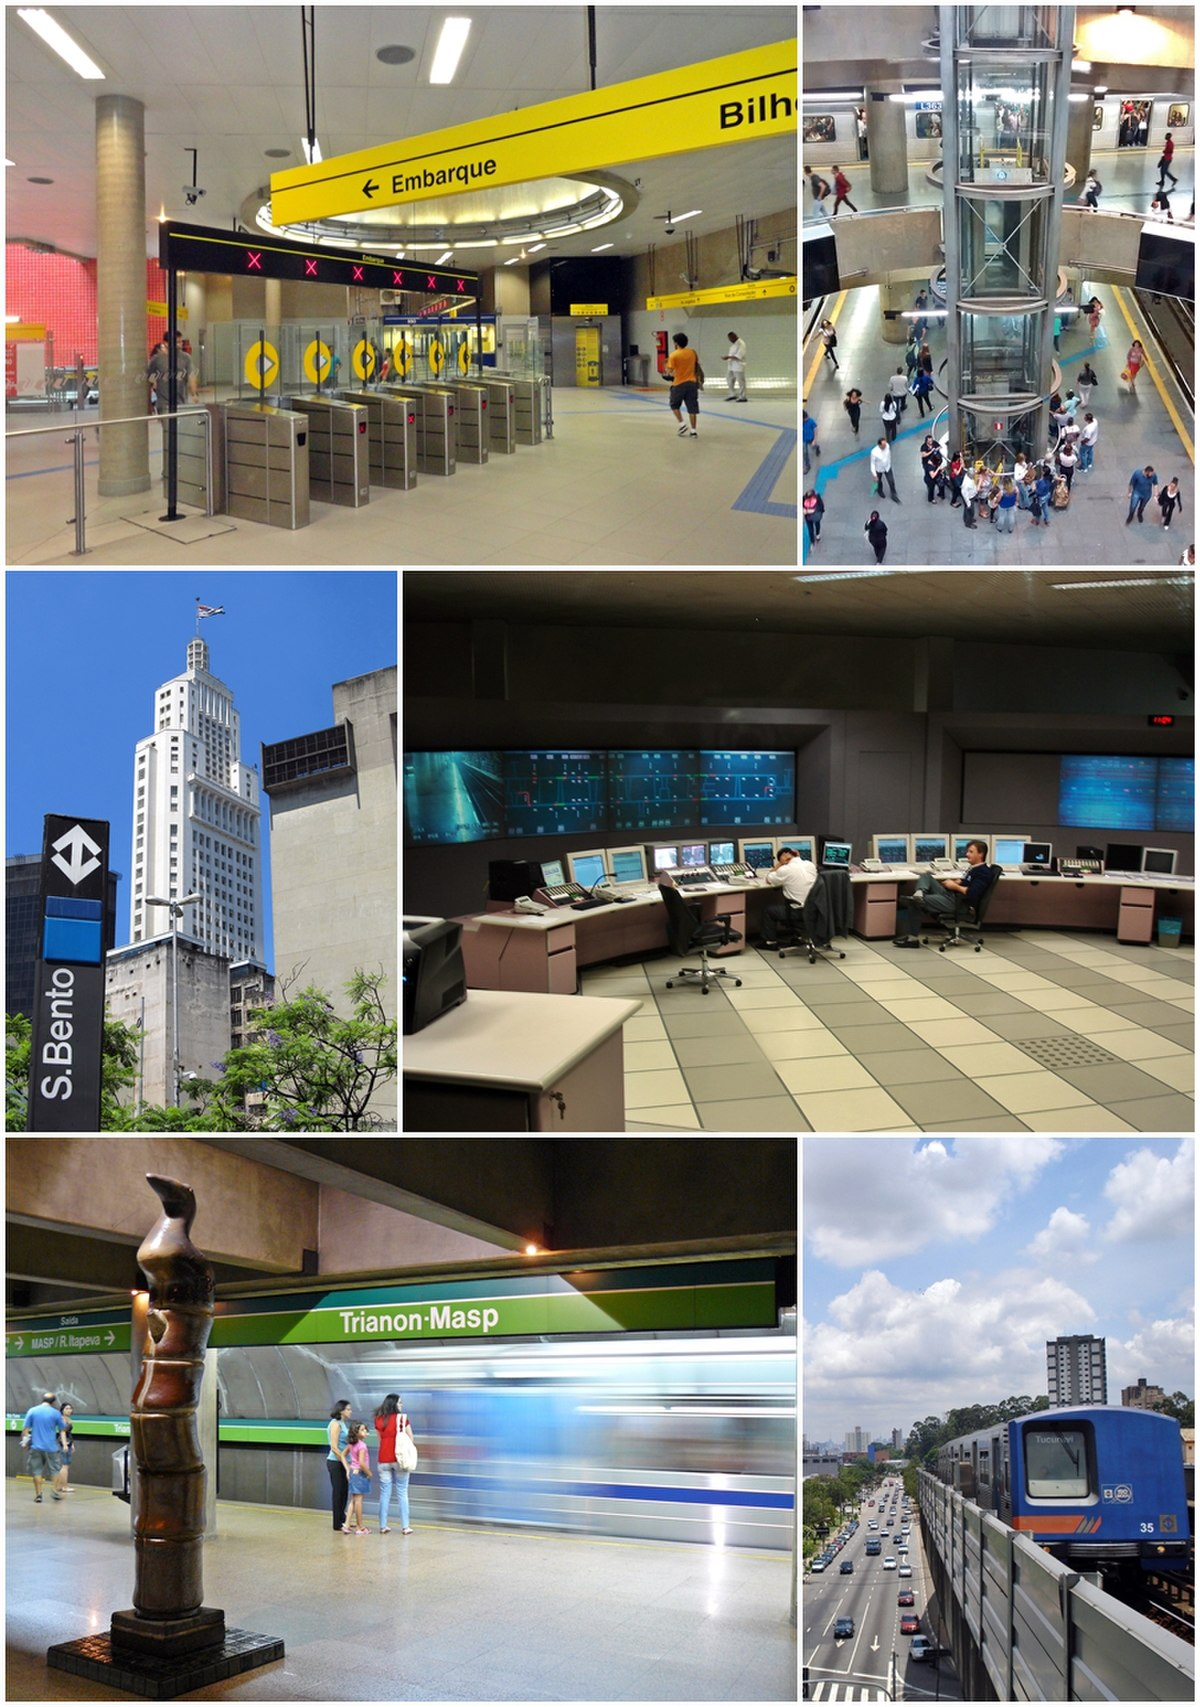 Metro de São Paulo - Wikipedia, la enciclopedia libre